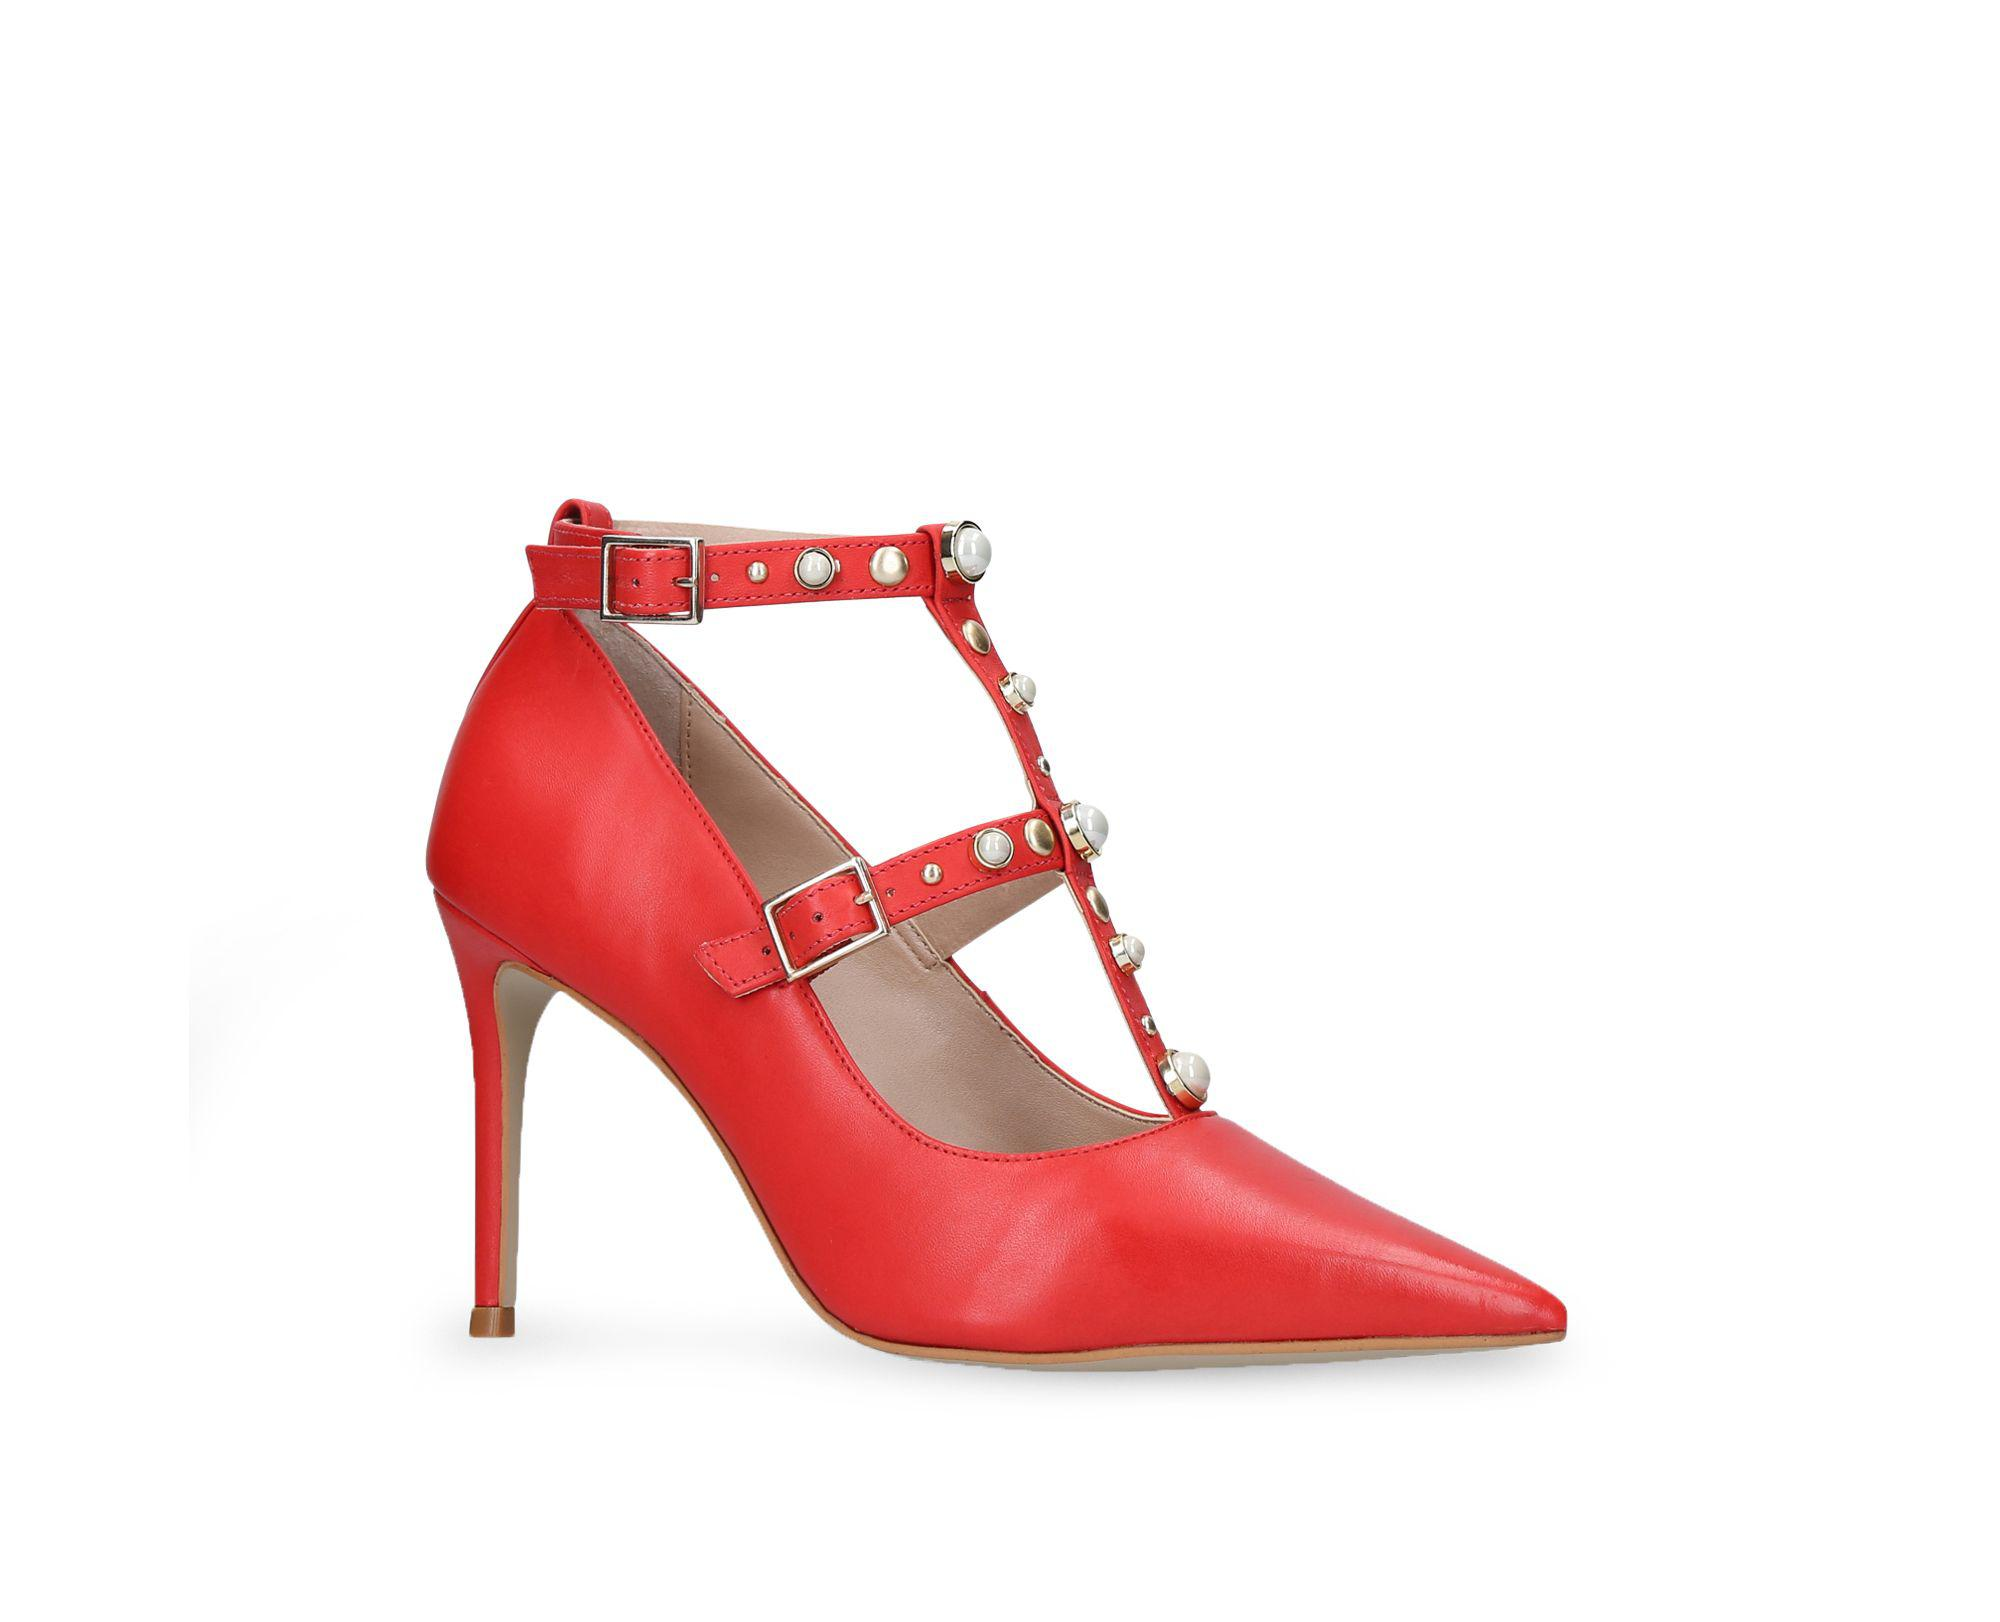 e345ed4a98 Carvela Kurt Geiger Agave High Heel Sandals in Red - Save 81% - Lyst